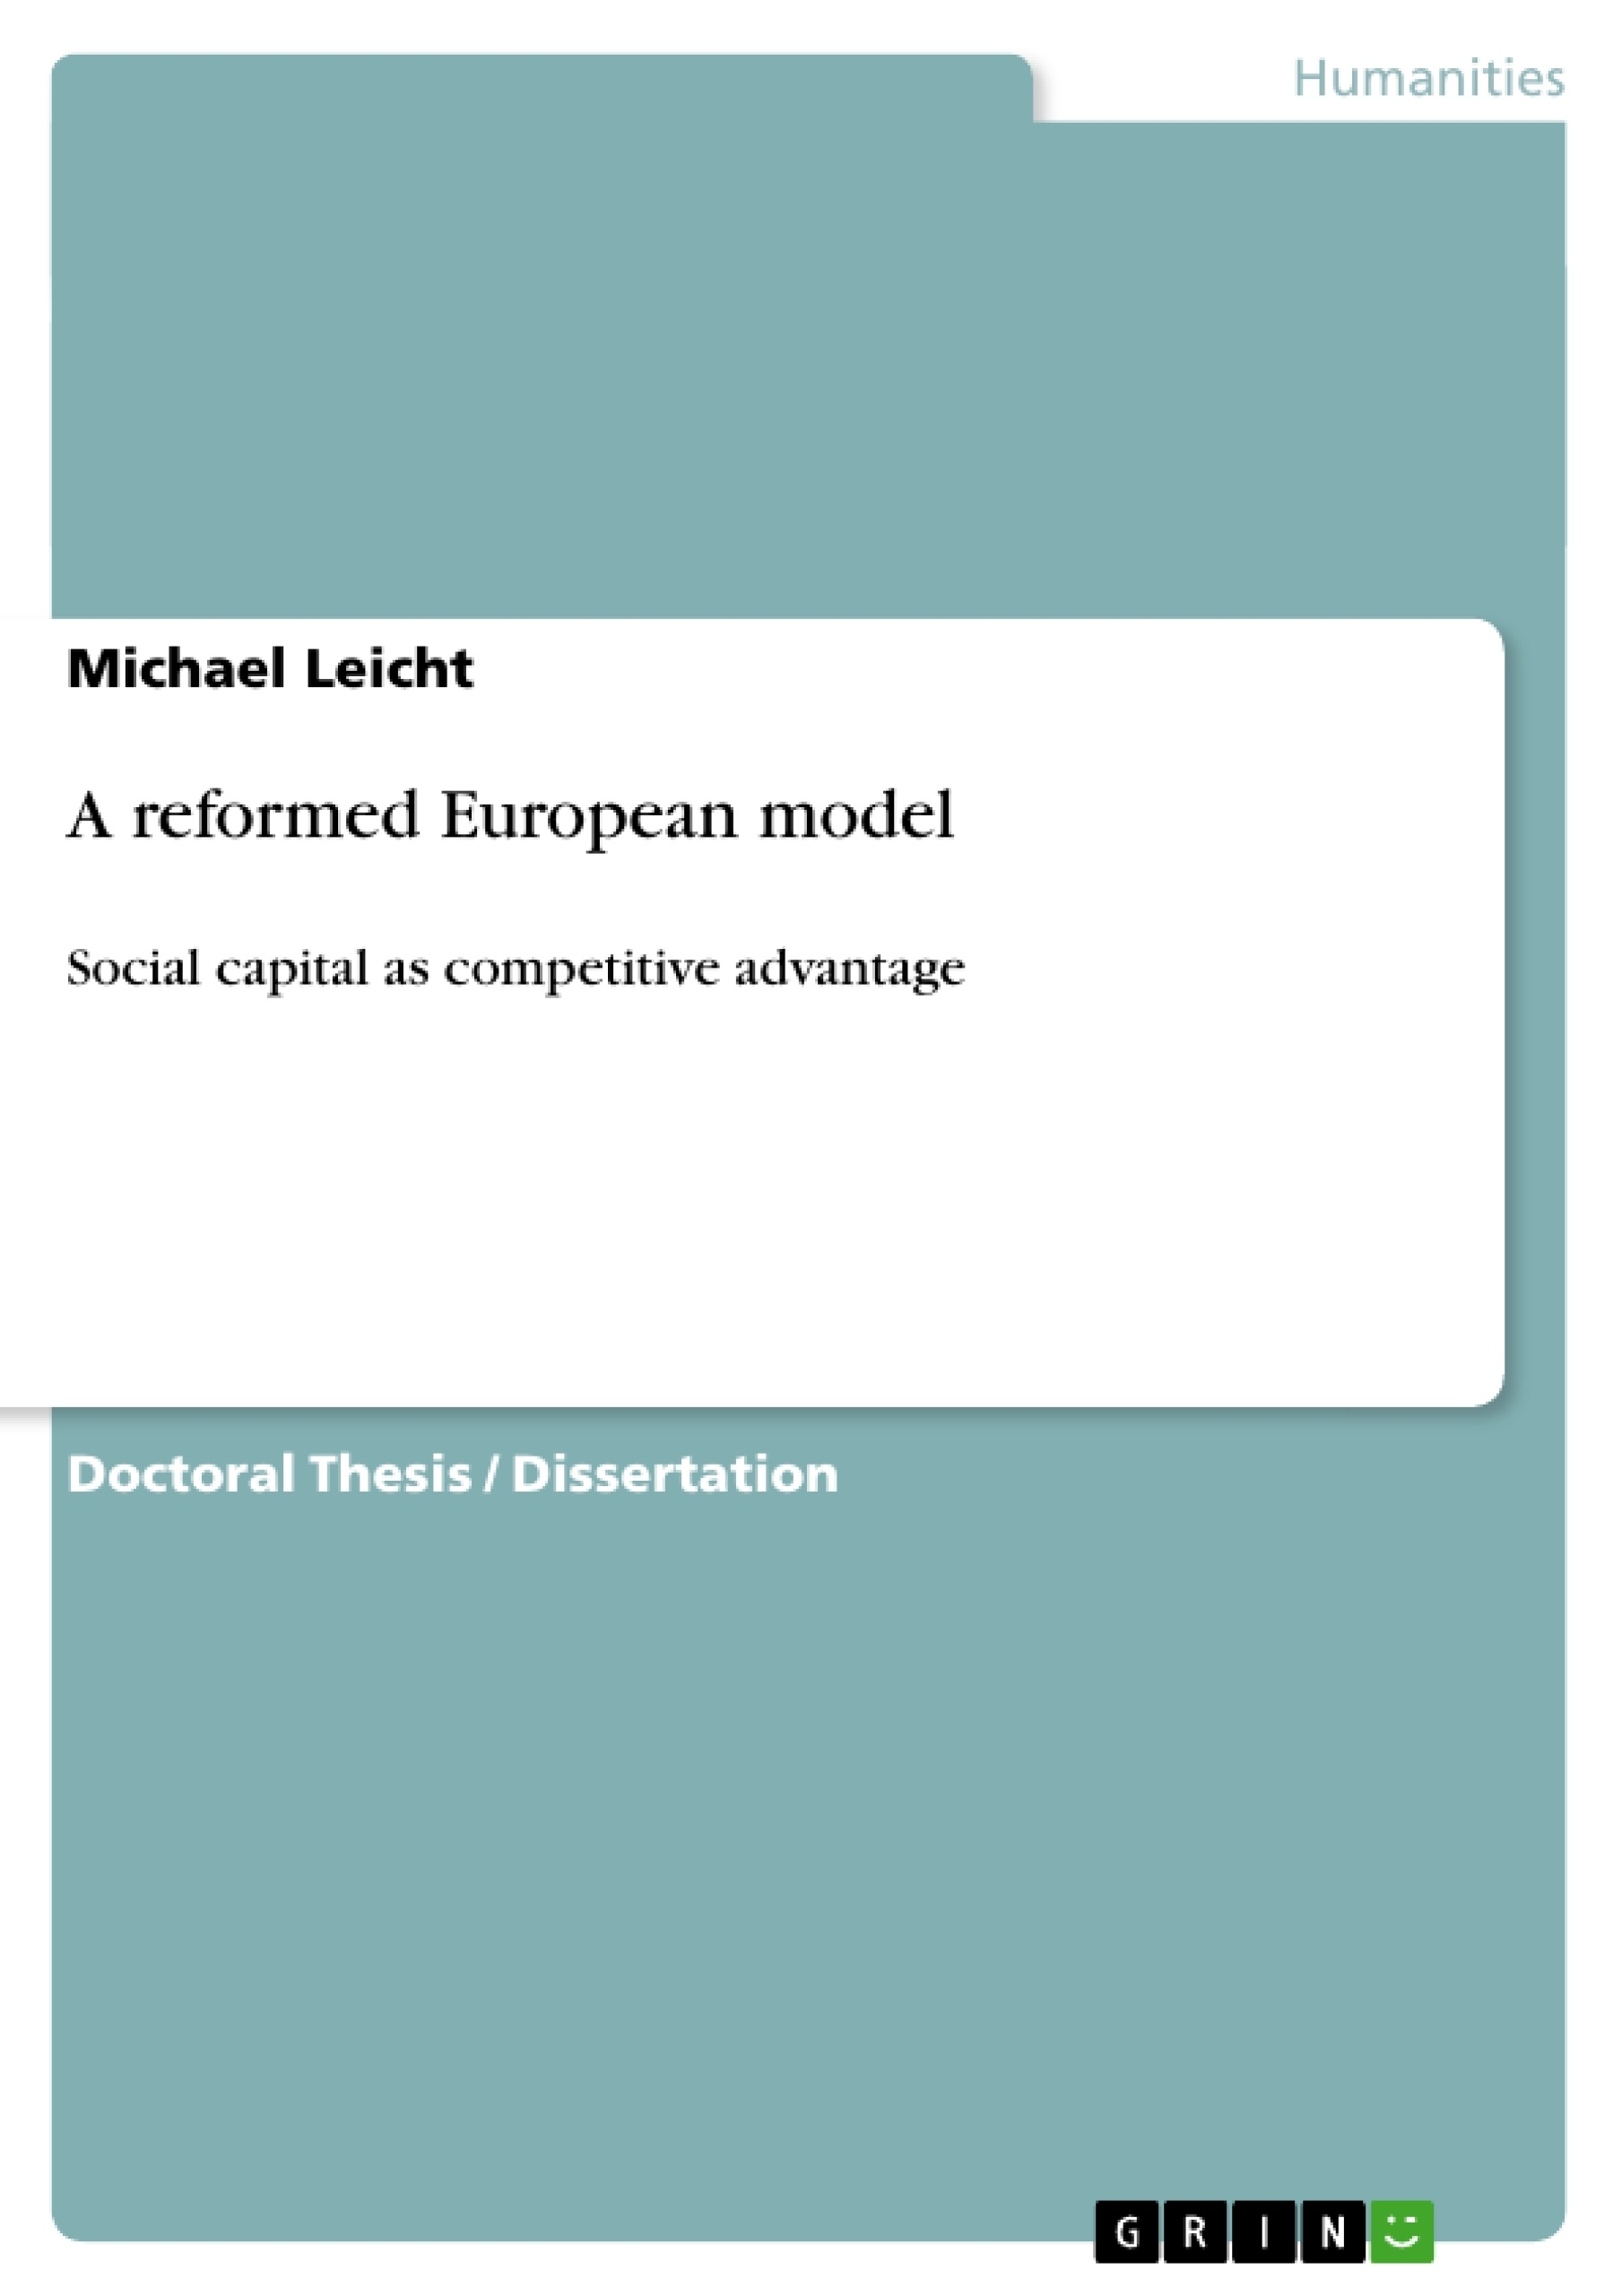 Title: A reformed European model